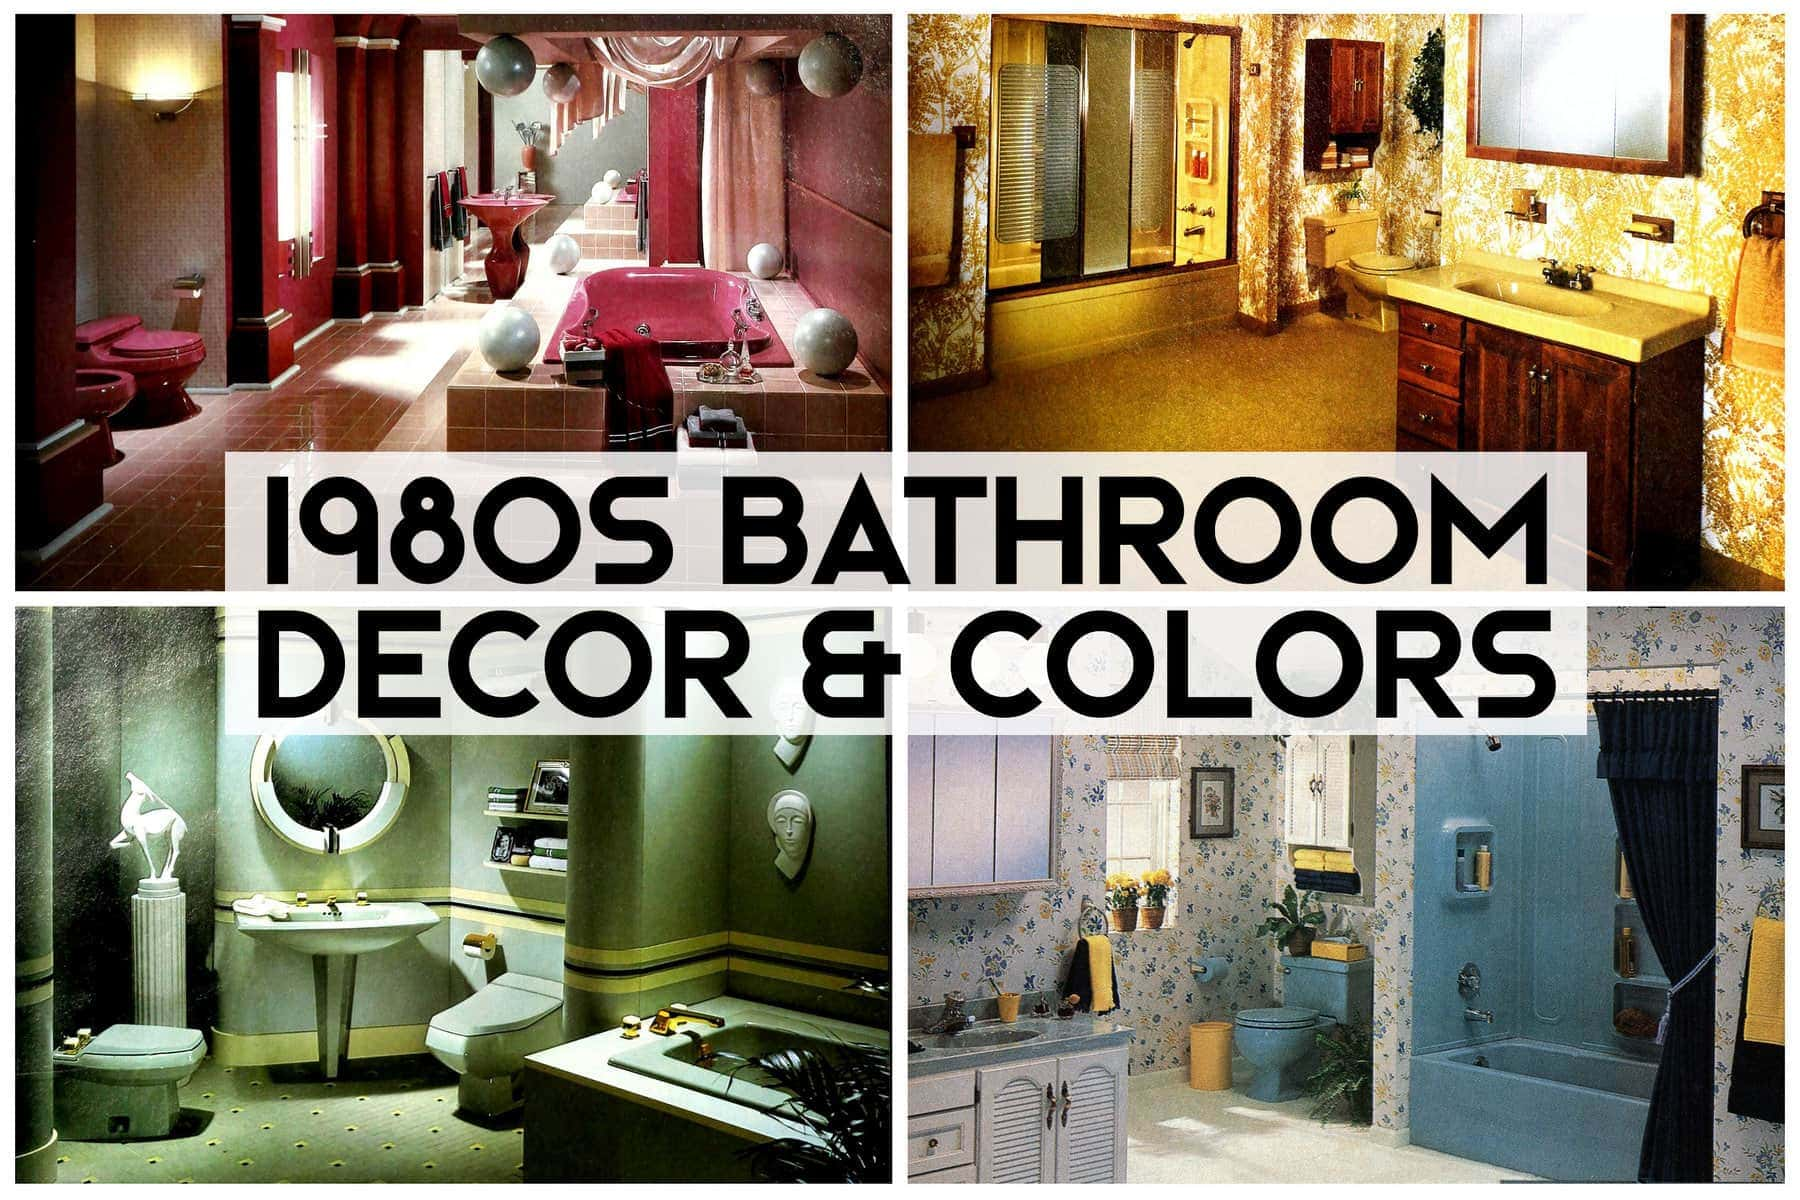 Vintage 1980s bathroom decor and color schemes